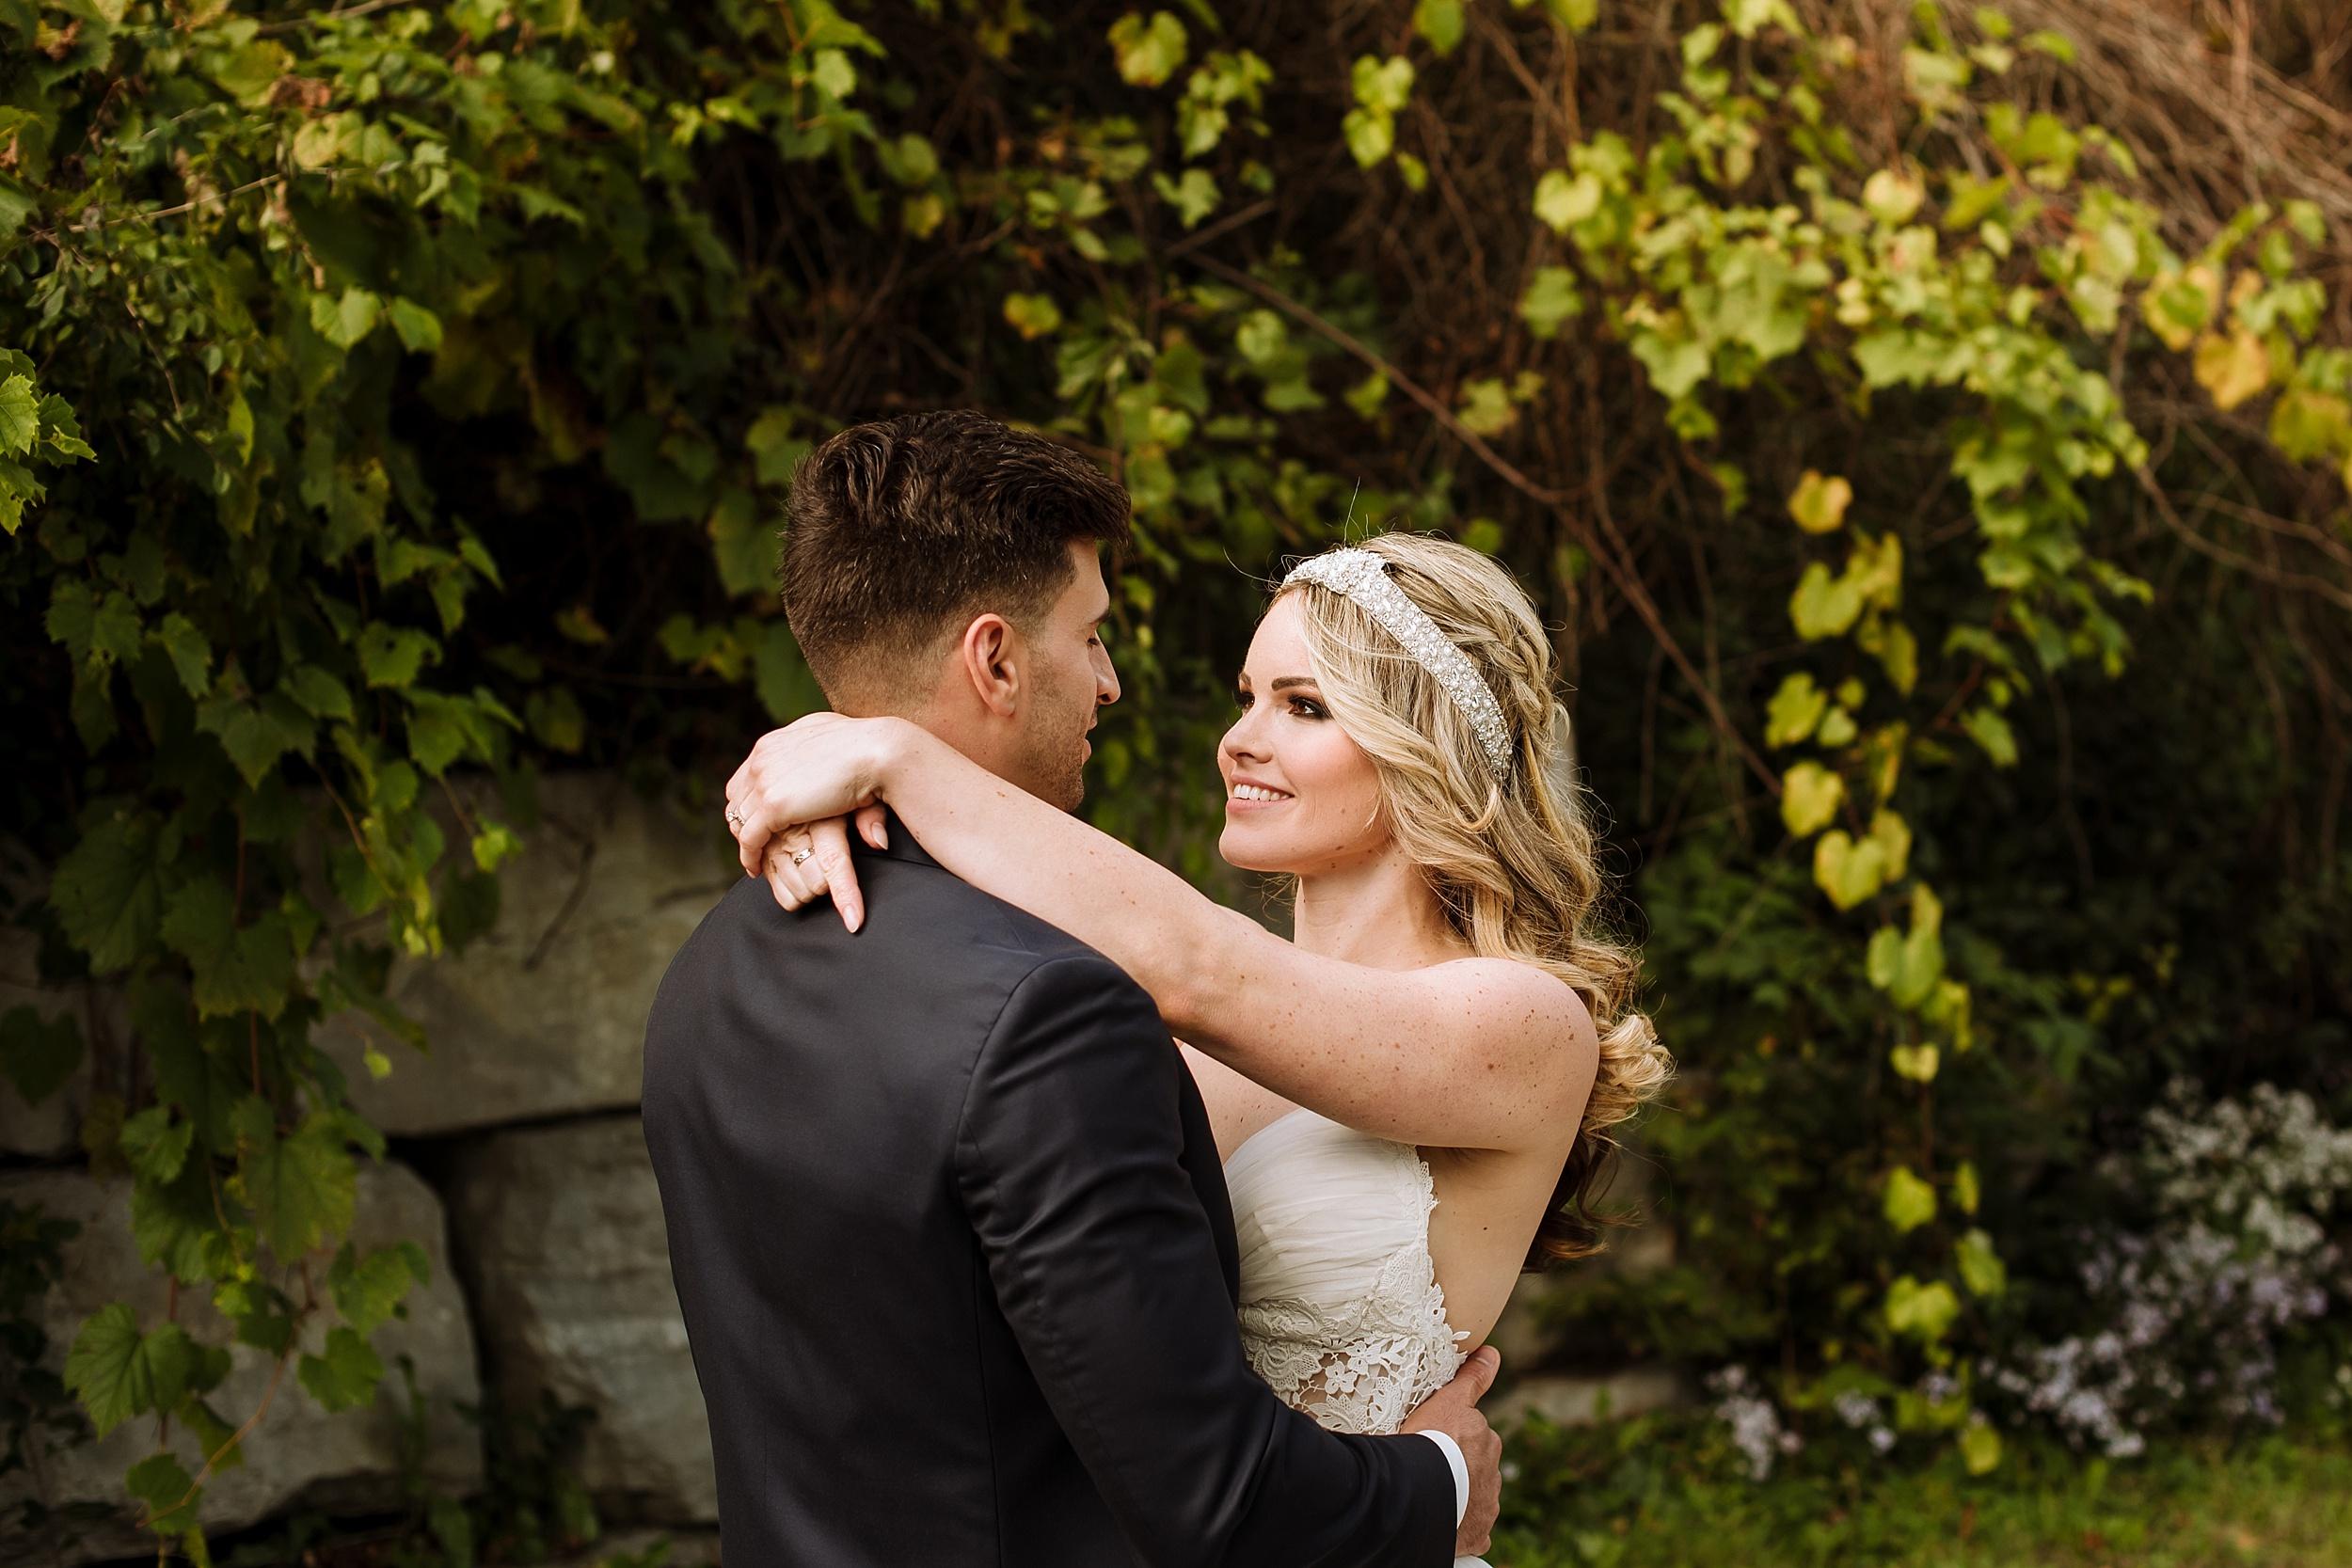 McMichael_Art_Collection_Wedding_chateau_le_jardin_Justine_Munro_Toronto_Photographer022.jpg